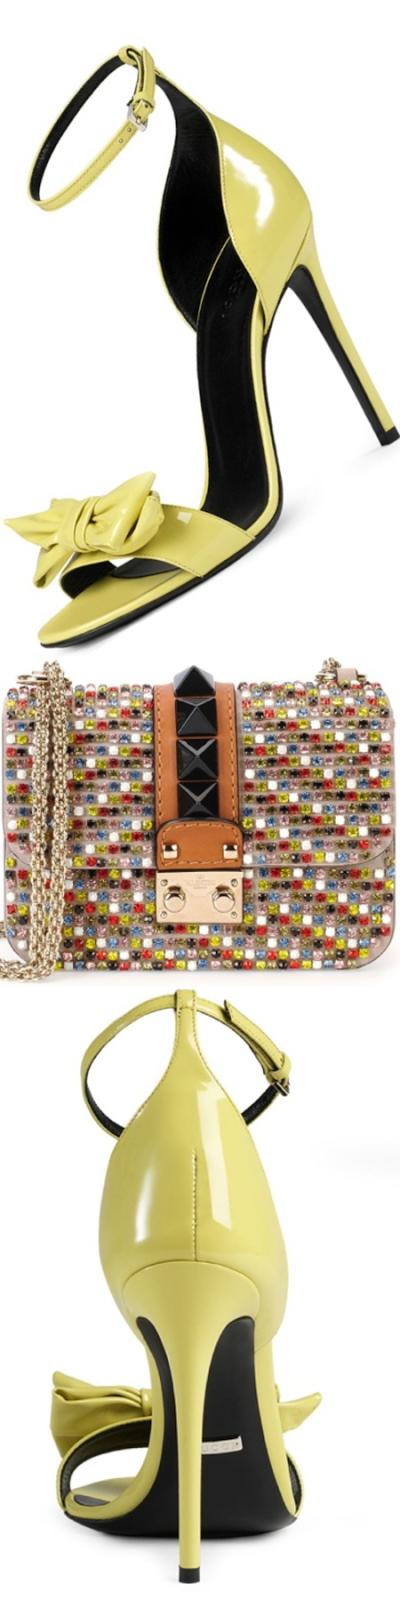 Gucci Clodine Patent Leather Sandal  Yellow